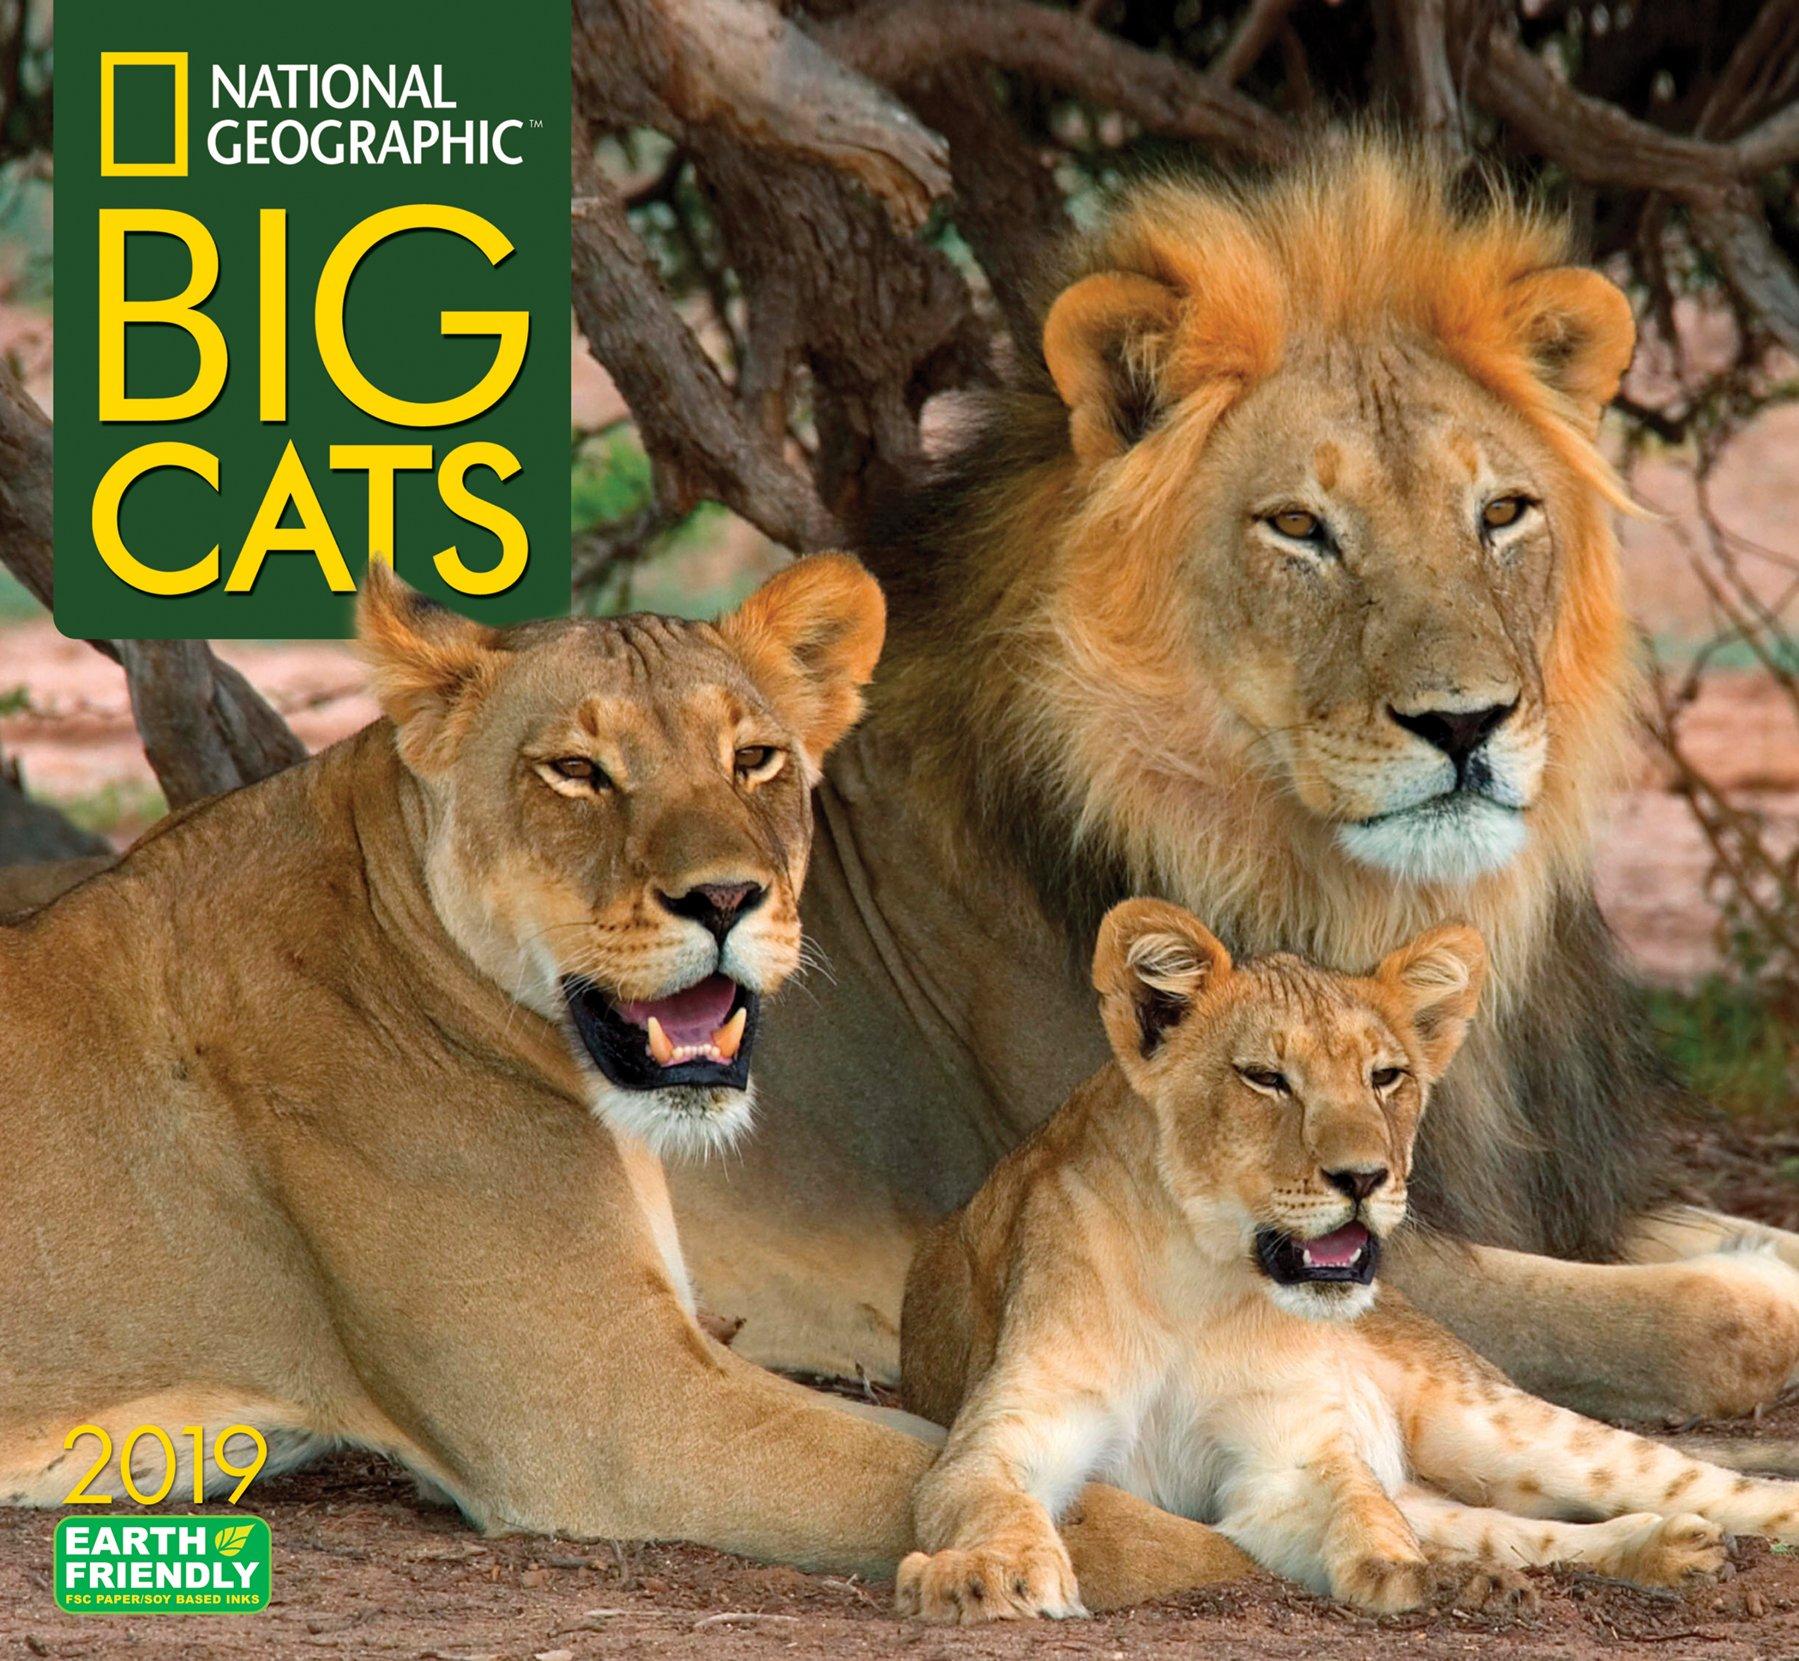 national geographic big cats 2019 wall calendar